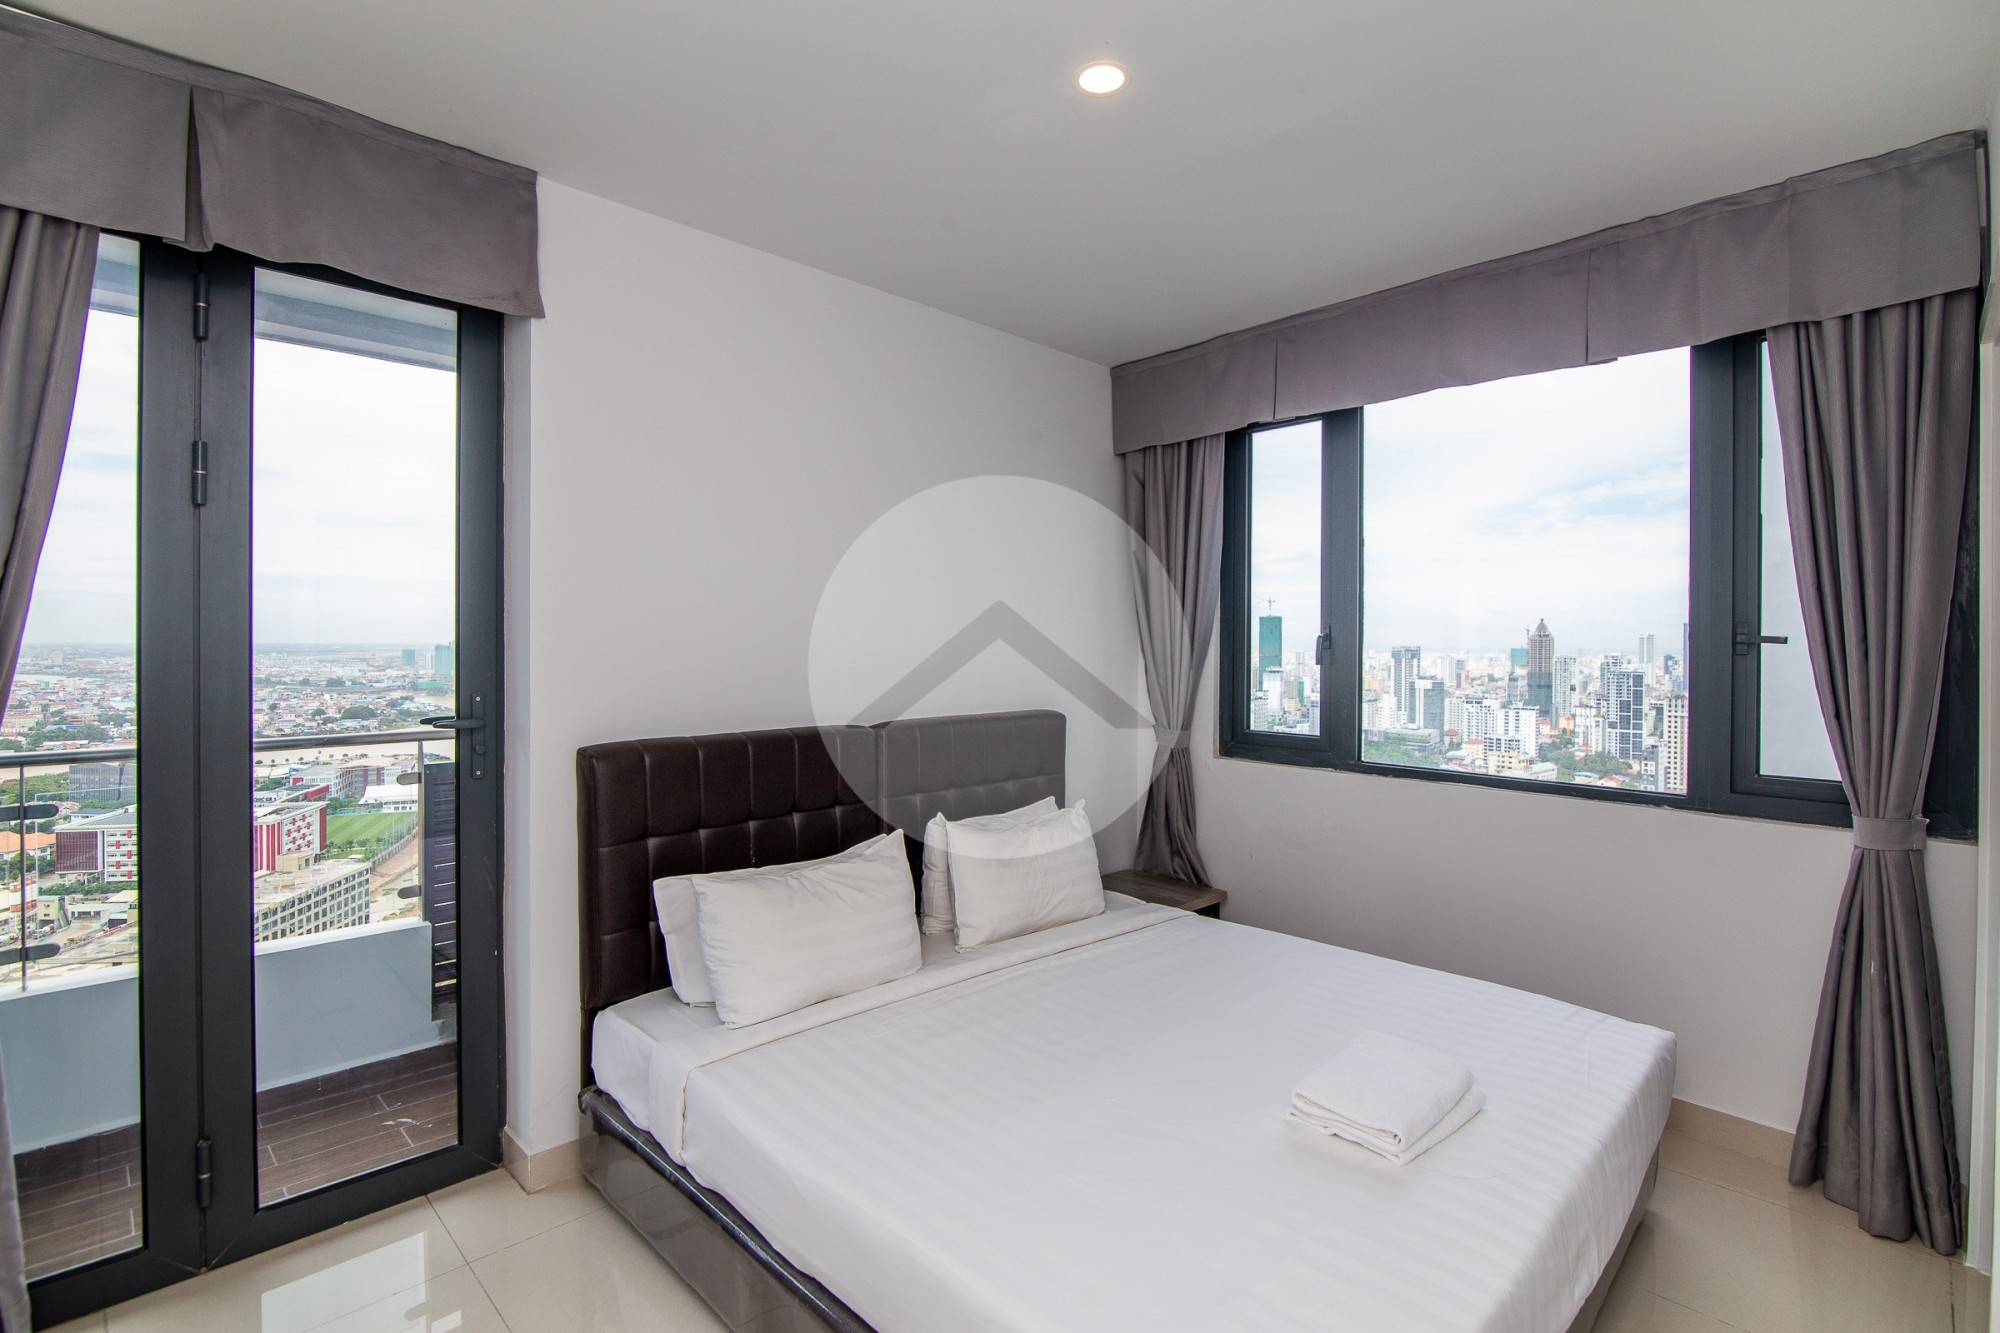 3 Bedrooms  Condo  For Sale - Tonle Bassac, Phnom Penh